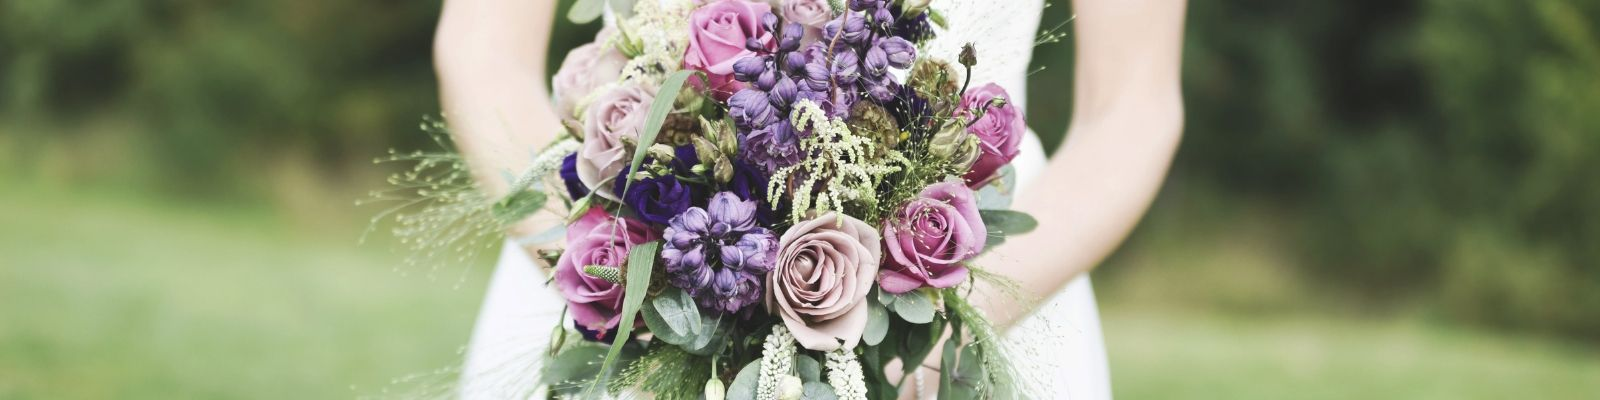 https://www.airfield.ie/wp-content/uploads/2019/05/Weddings-bouquet-at-Airfield-Estate-min.jpg